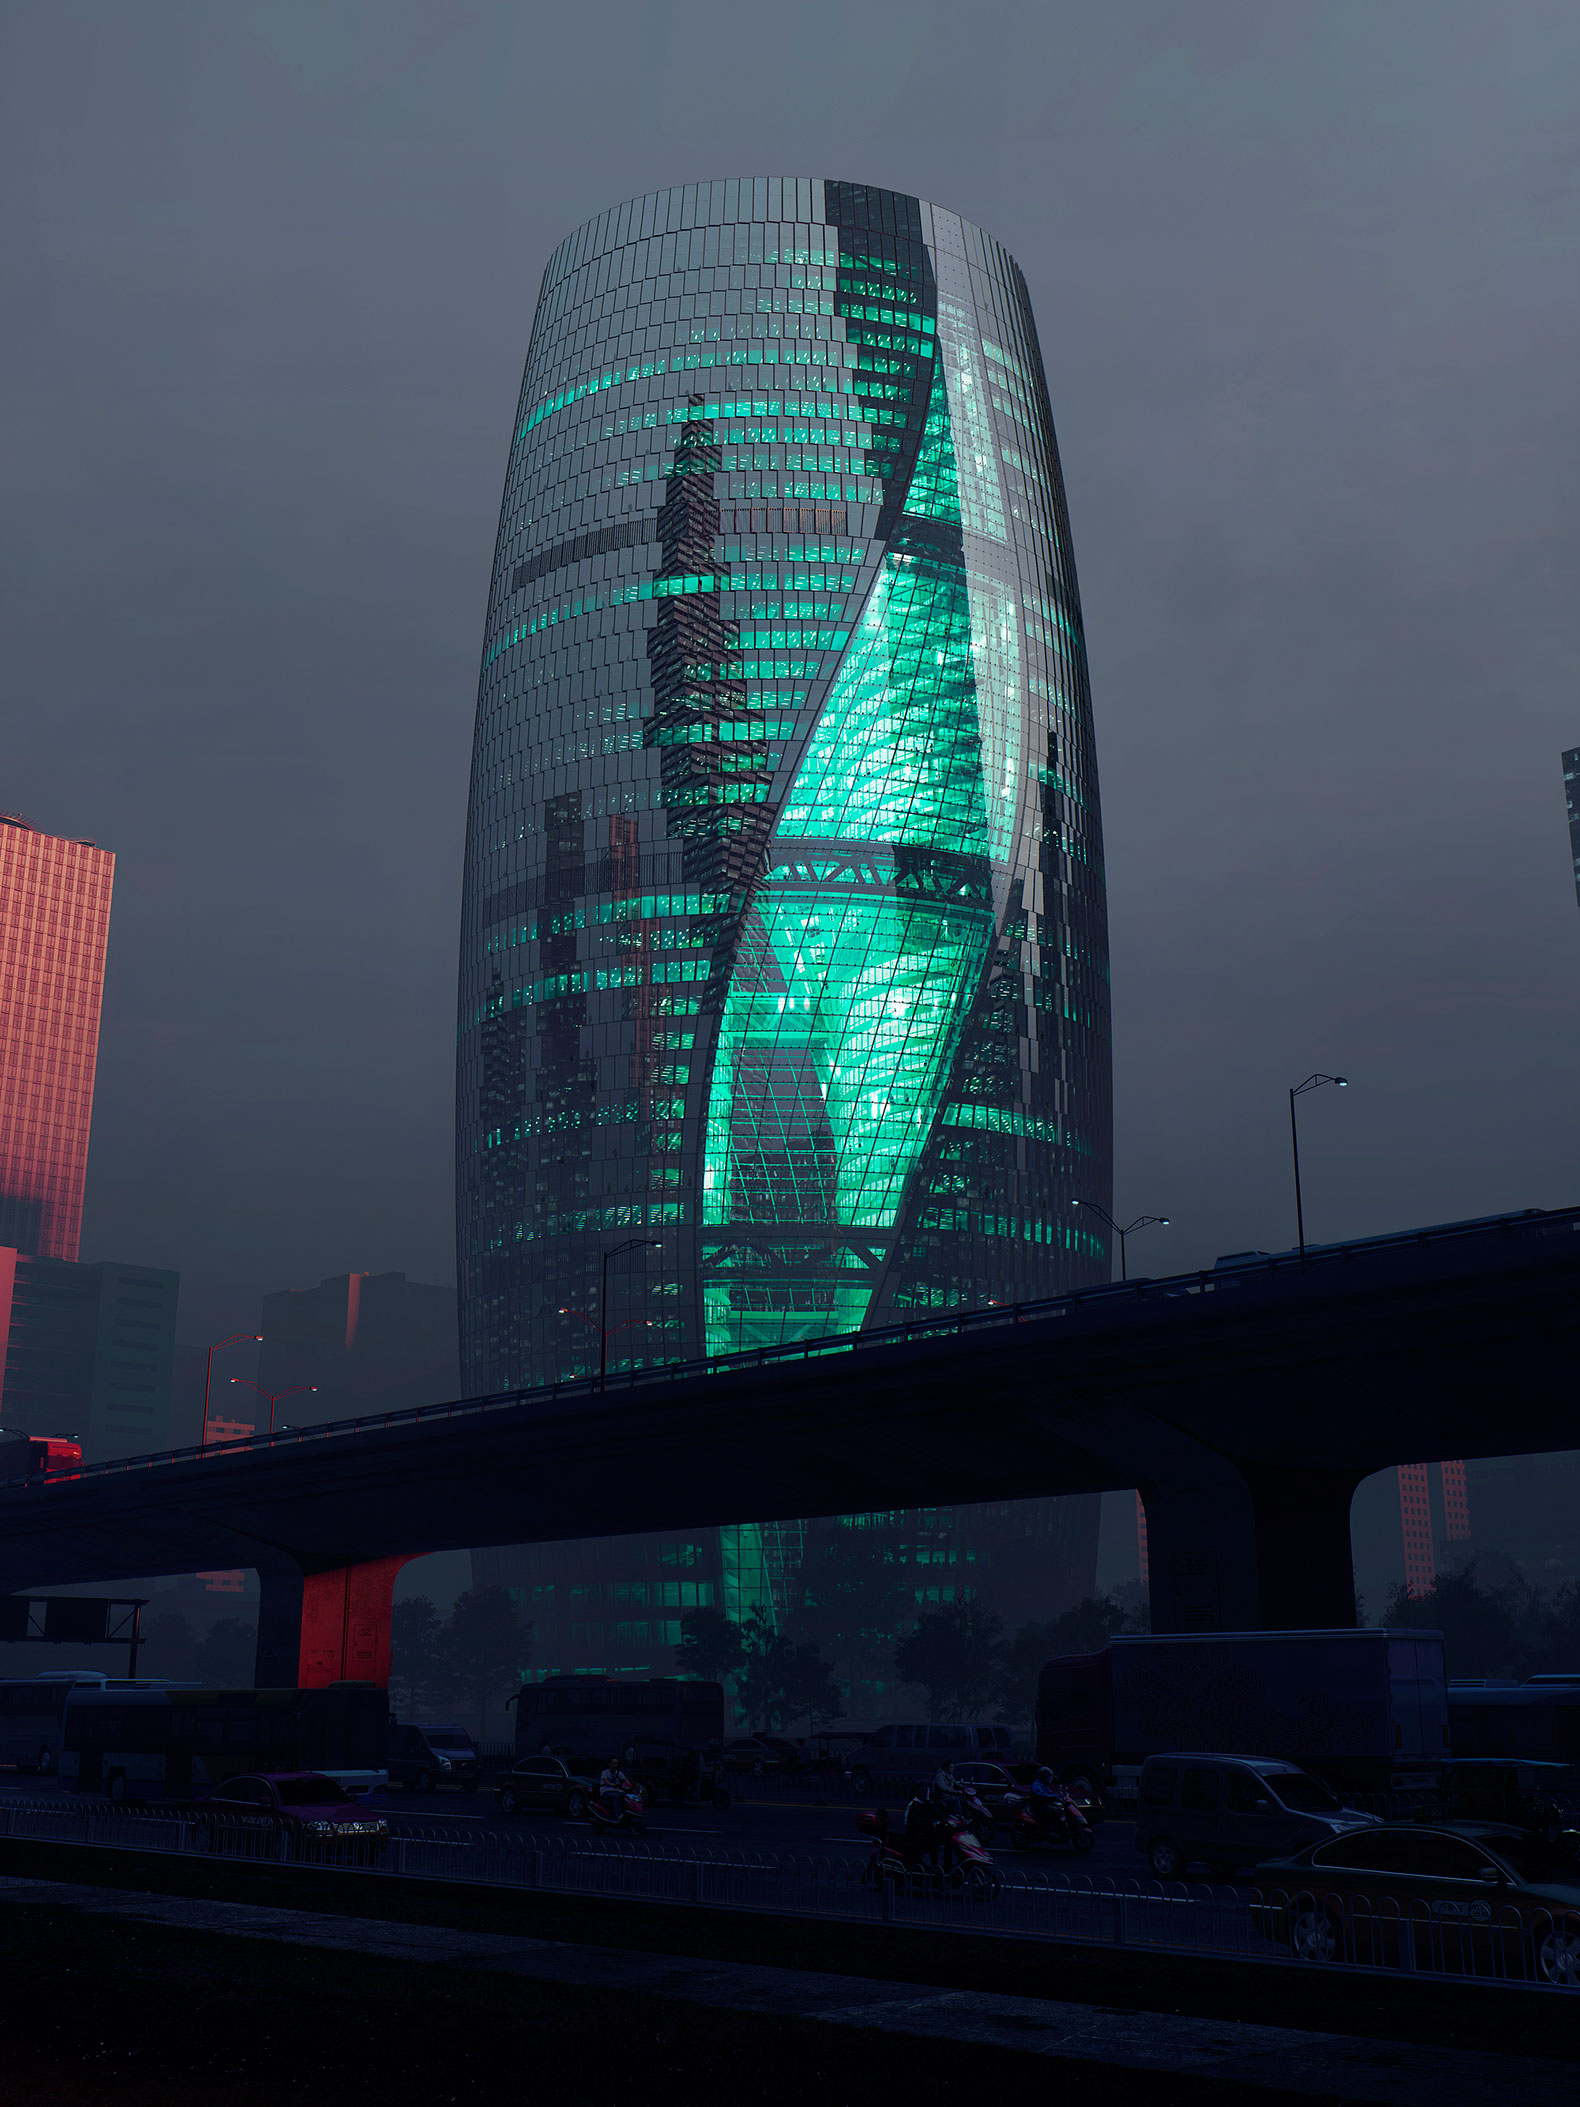 Zaha hadid architects presents leeza soho skyscraper in for Architecte hadid zaha